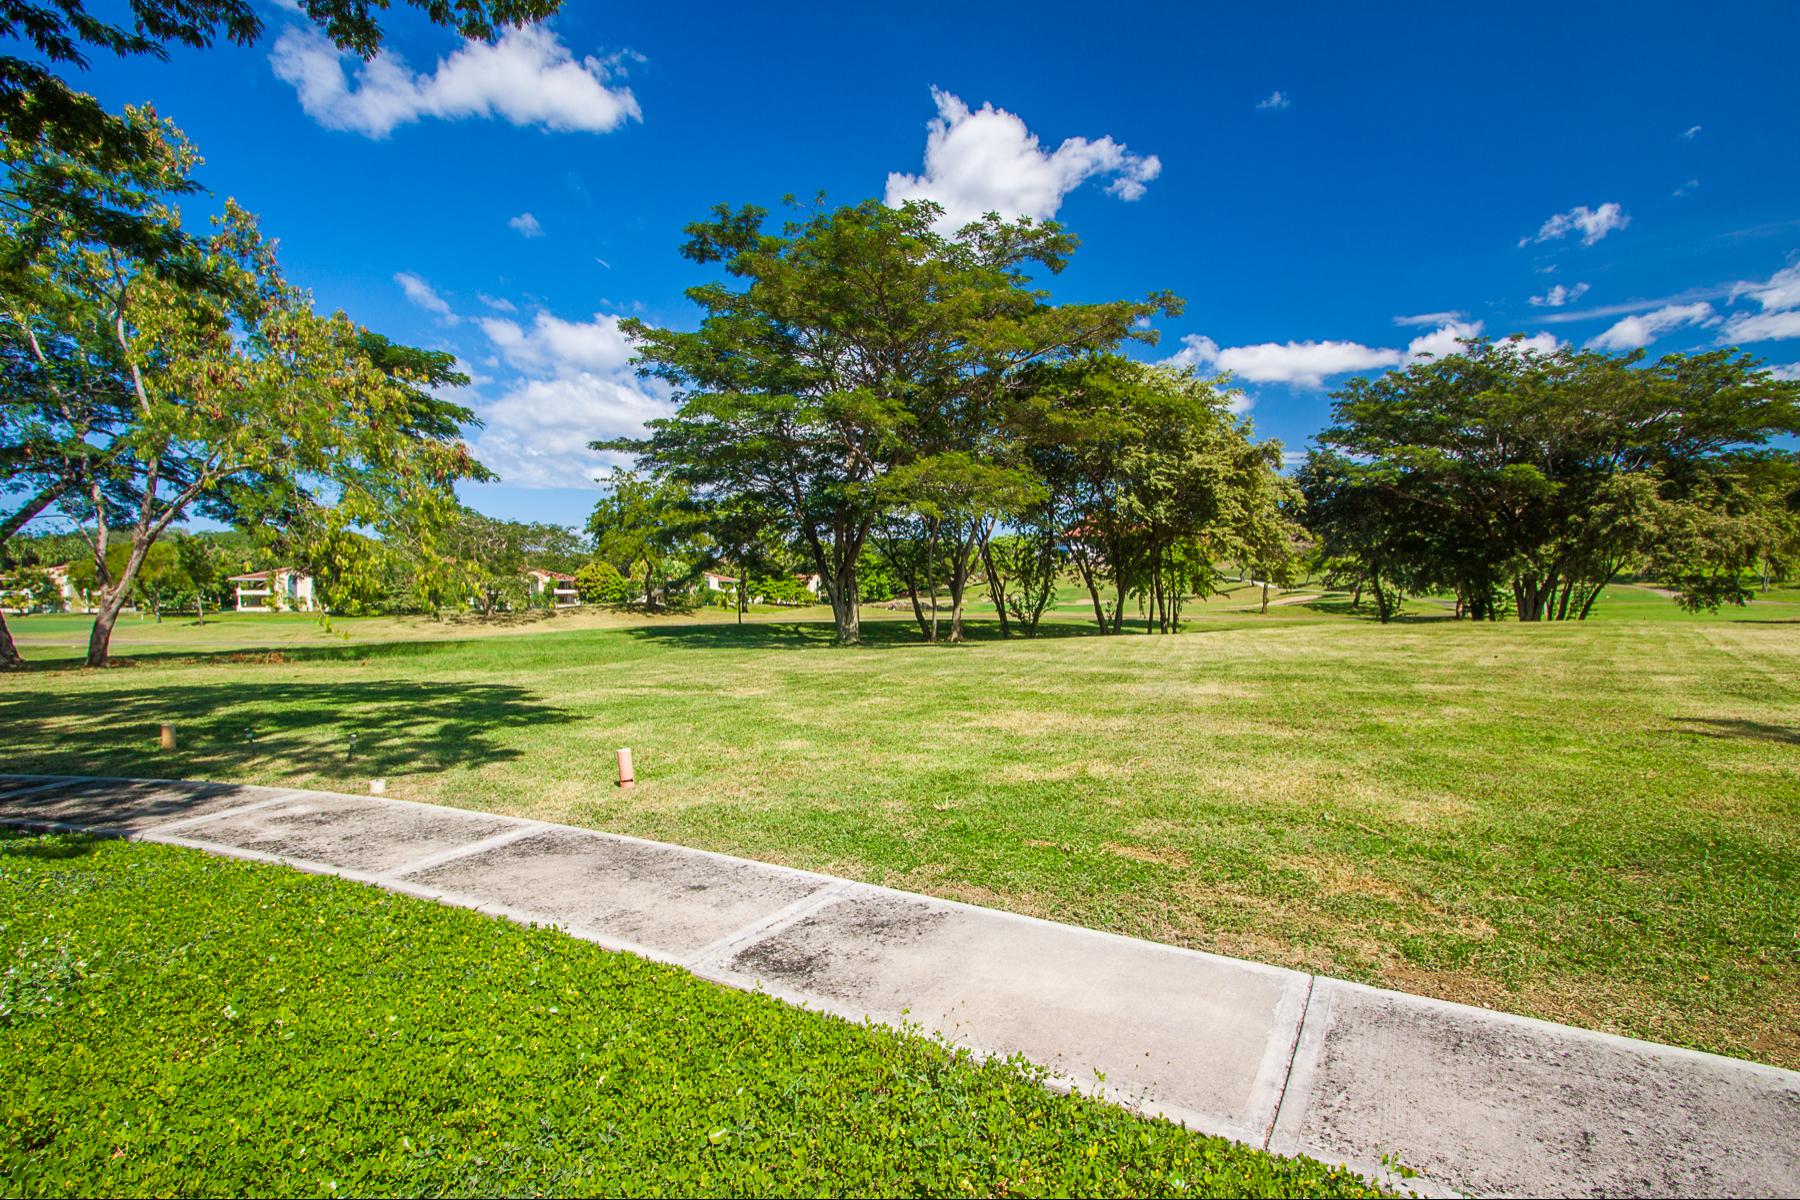 Additional photo for property listing at Llama del Bosque 8 Reserva Conchal, Guanacaste Costa Rica